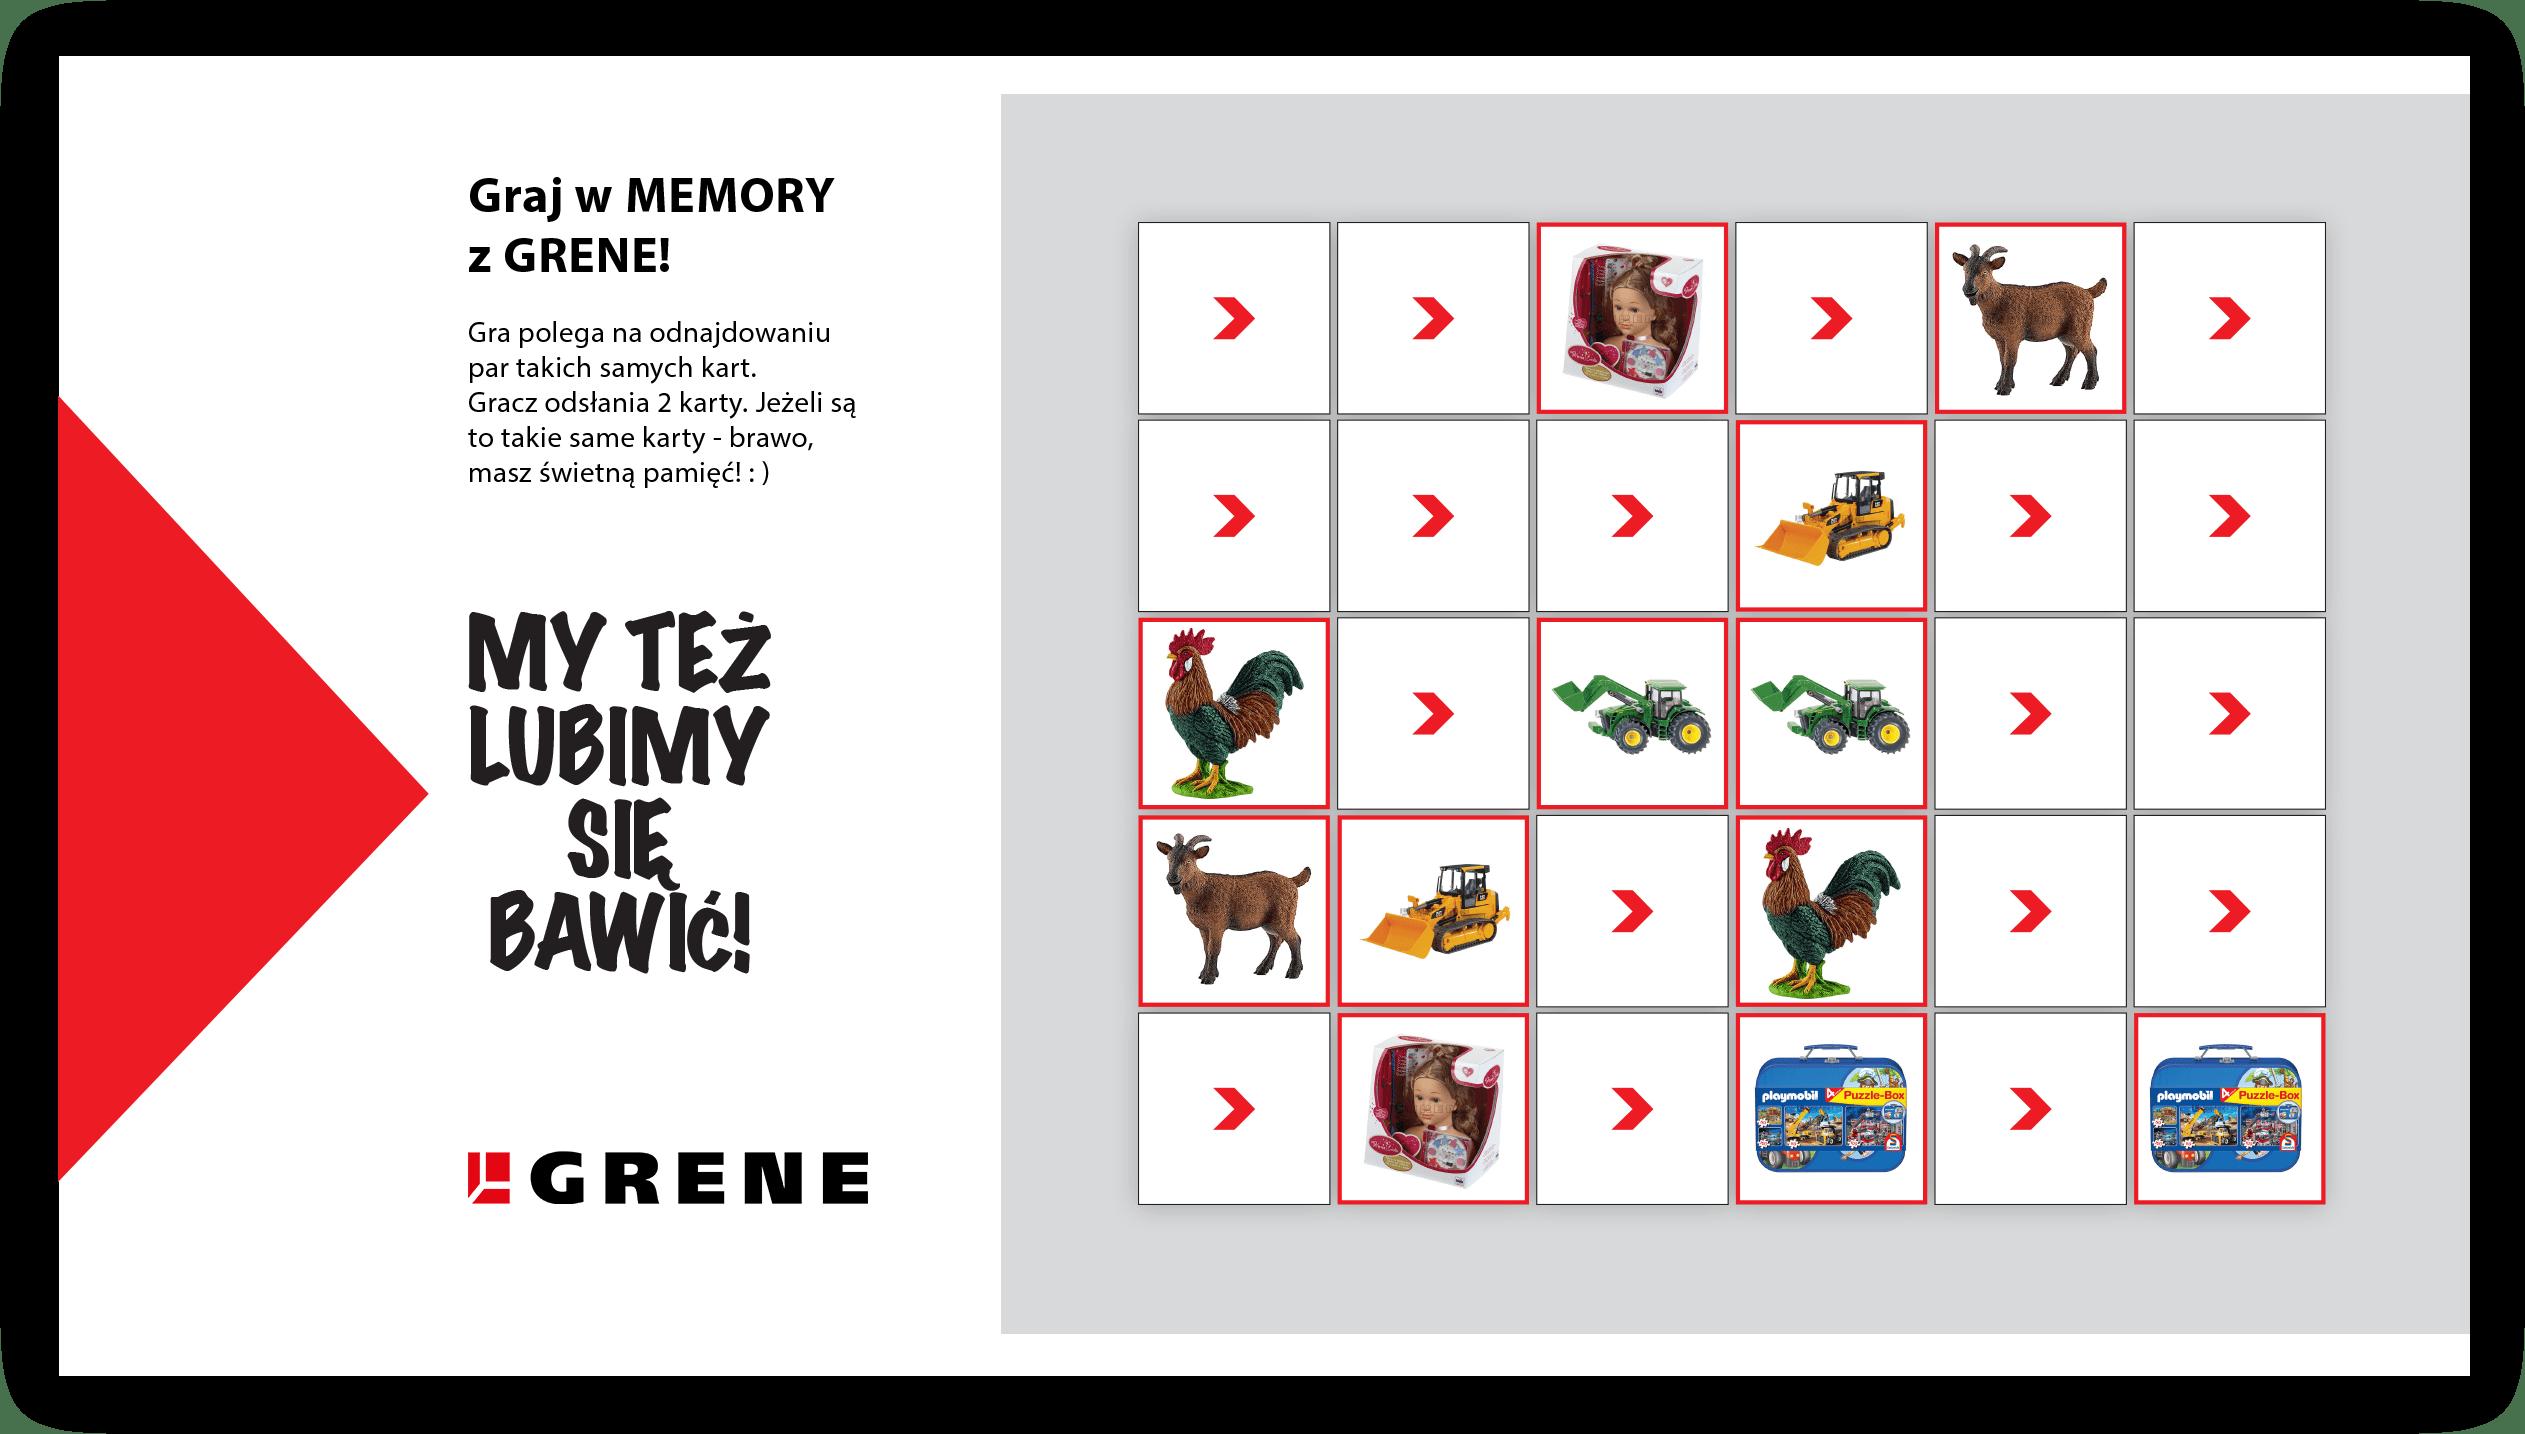 GRENE_DD_memory